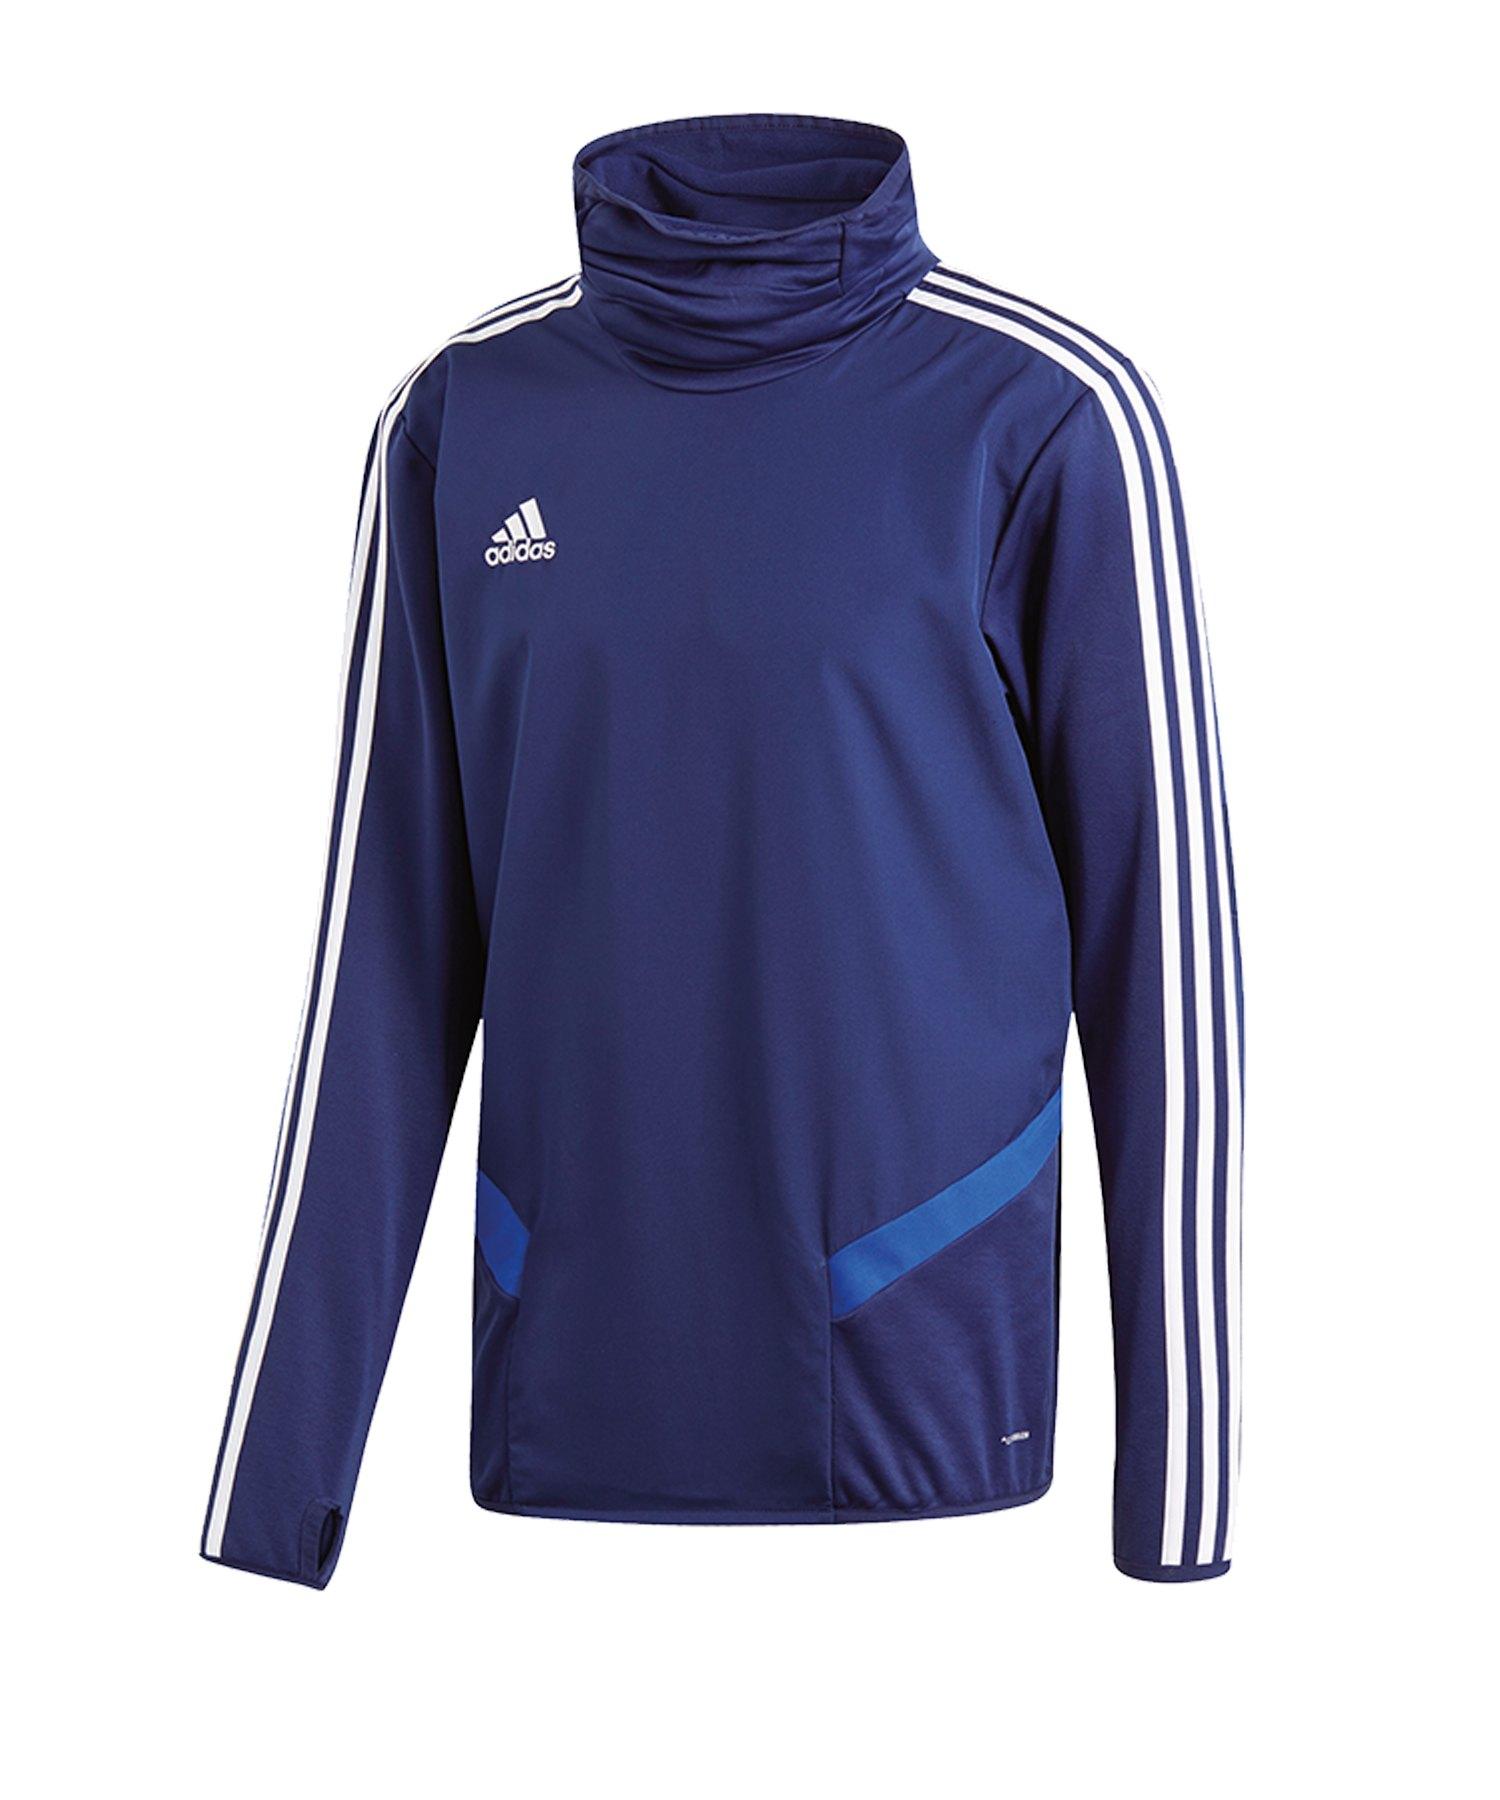 adidas Tiro 19 Warm Top Sweatshirt Dunkelblau - blau